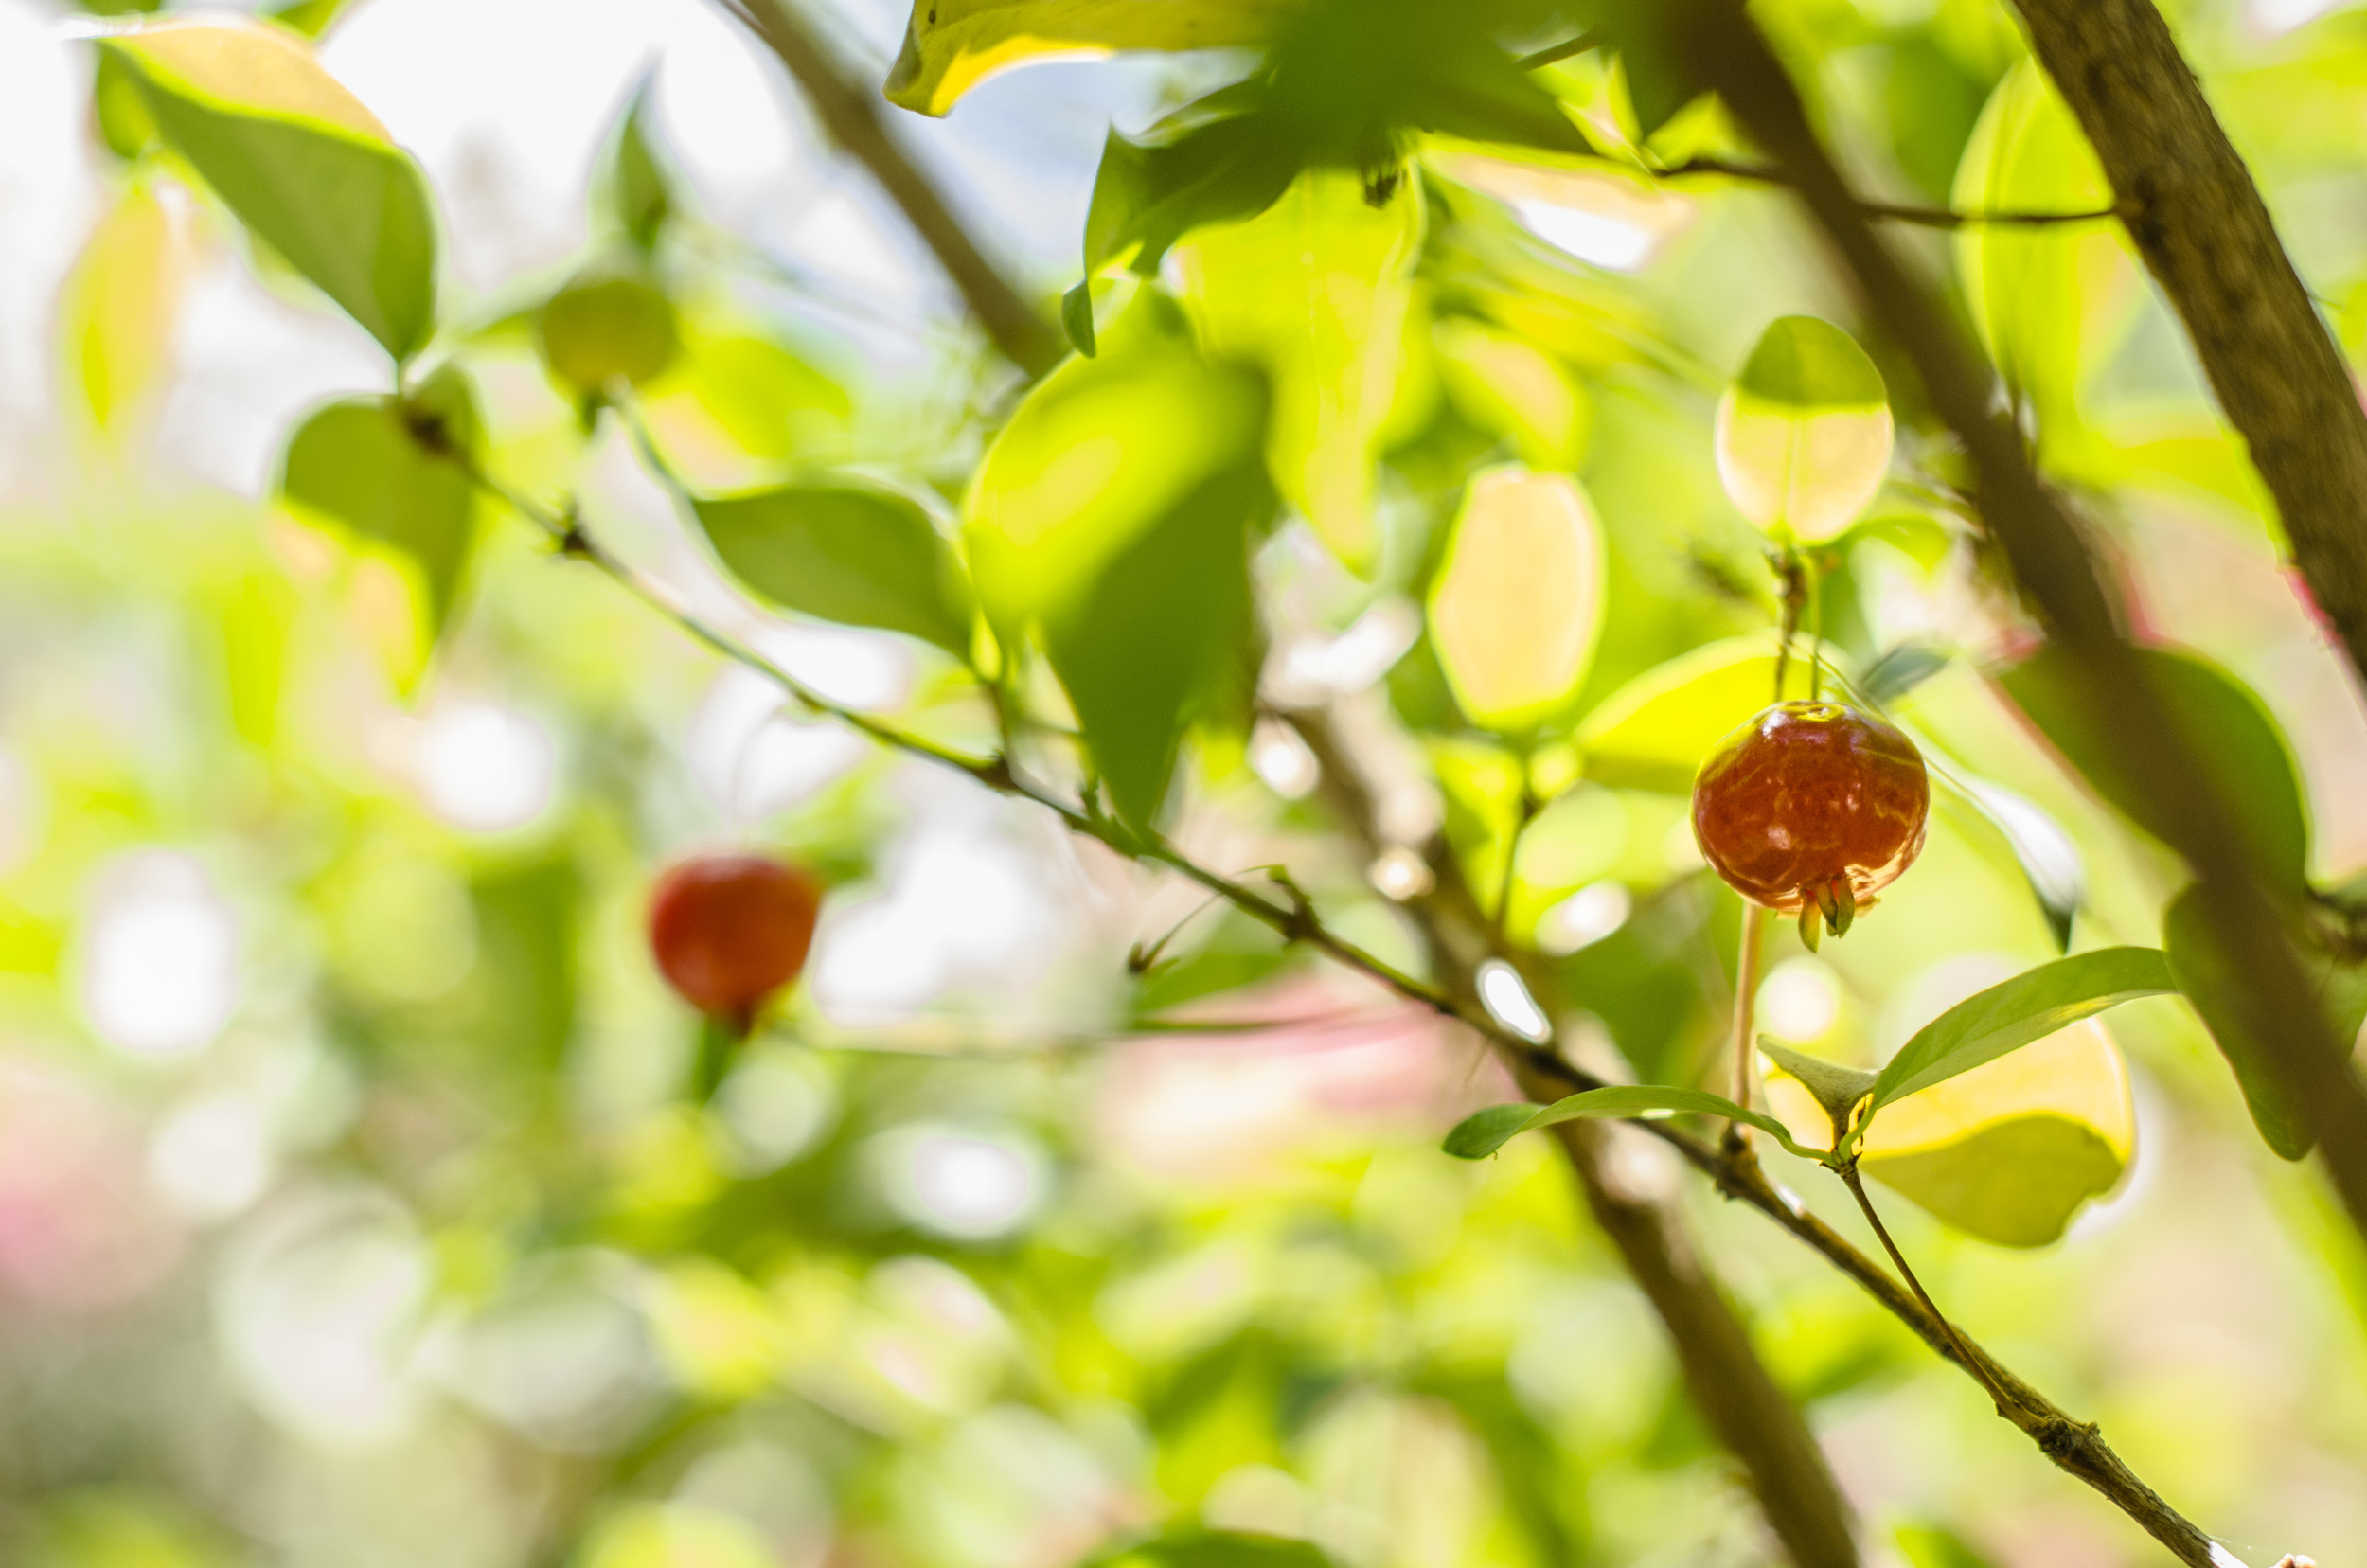 The Pitango fruits